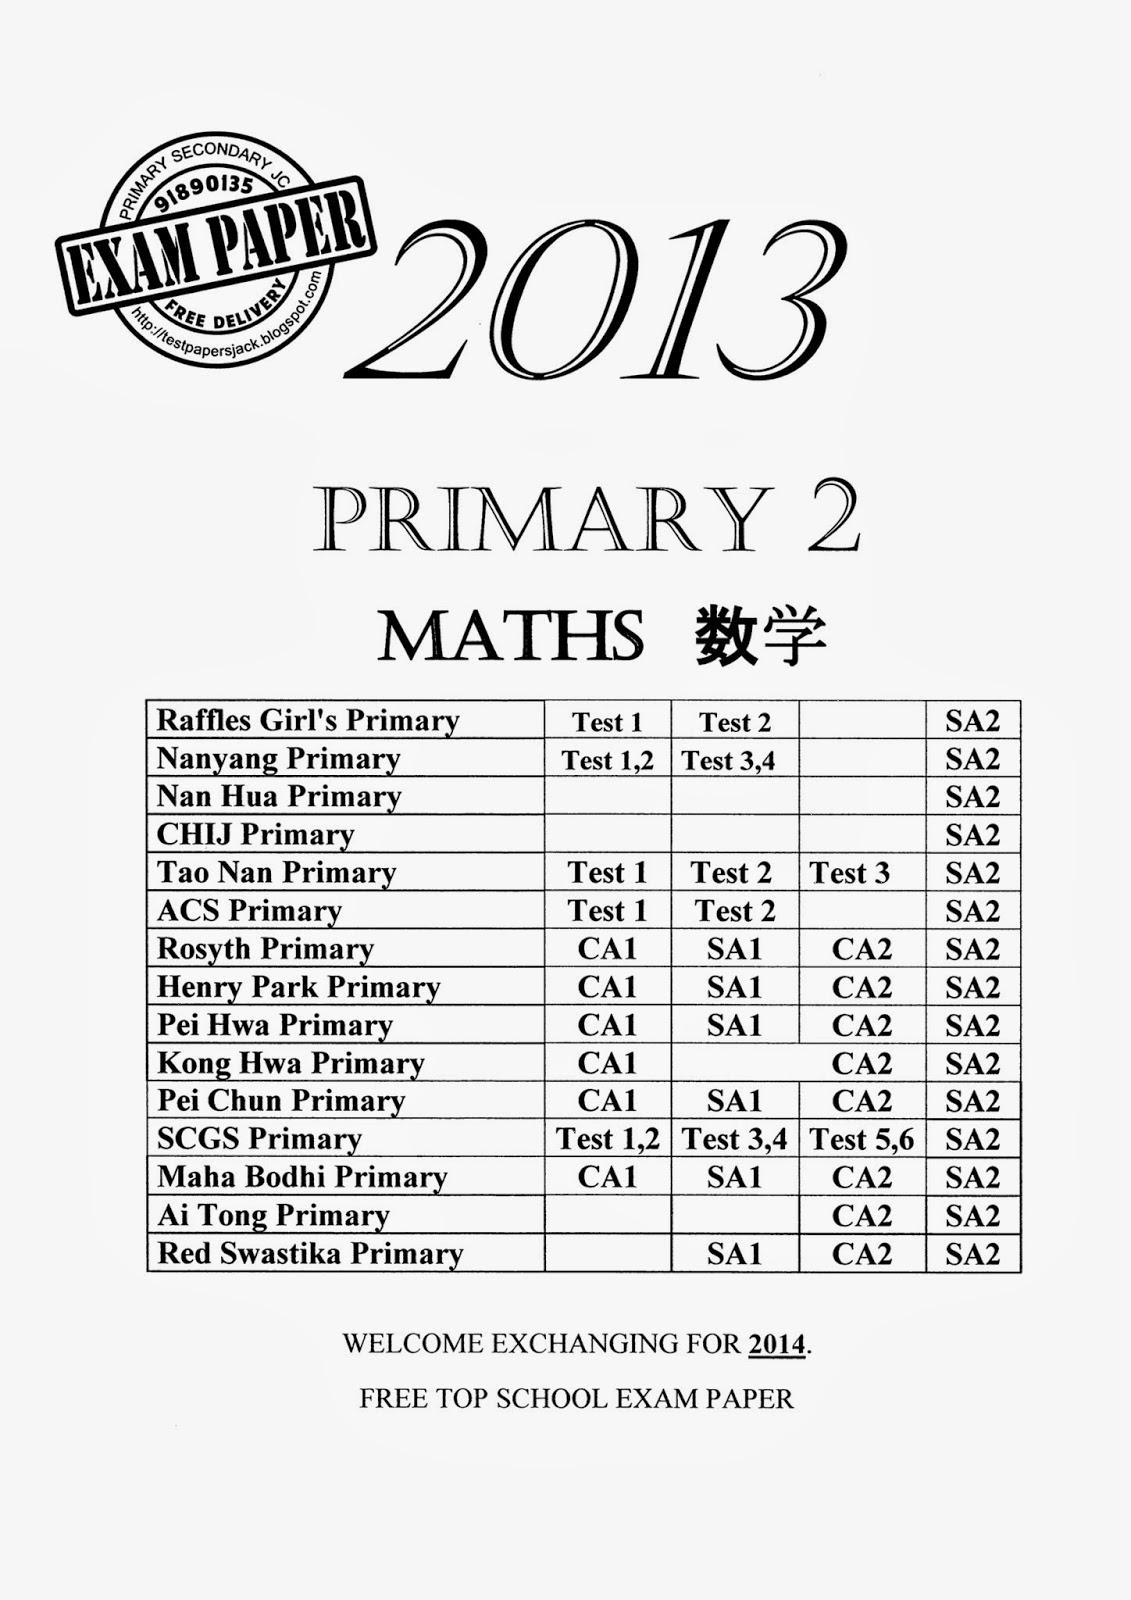 Exam Paper EXAM PAPER Exam Paper : Primary 2 ( Special